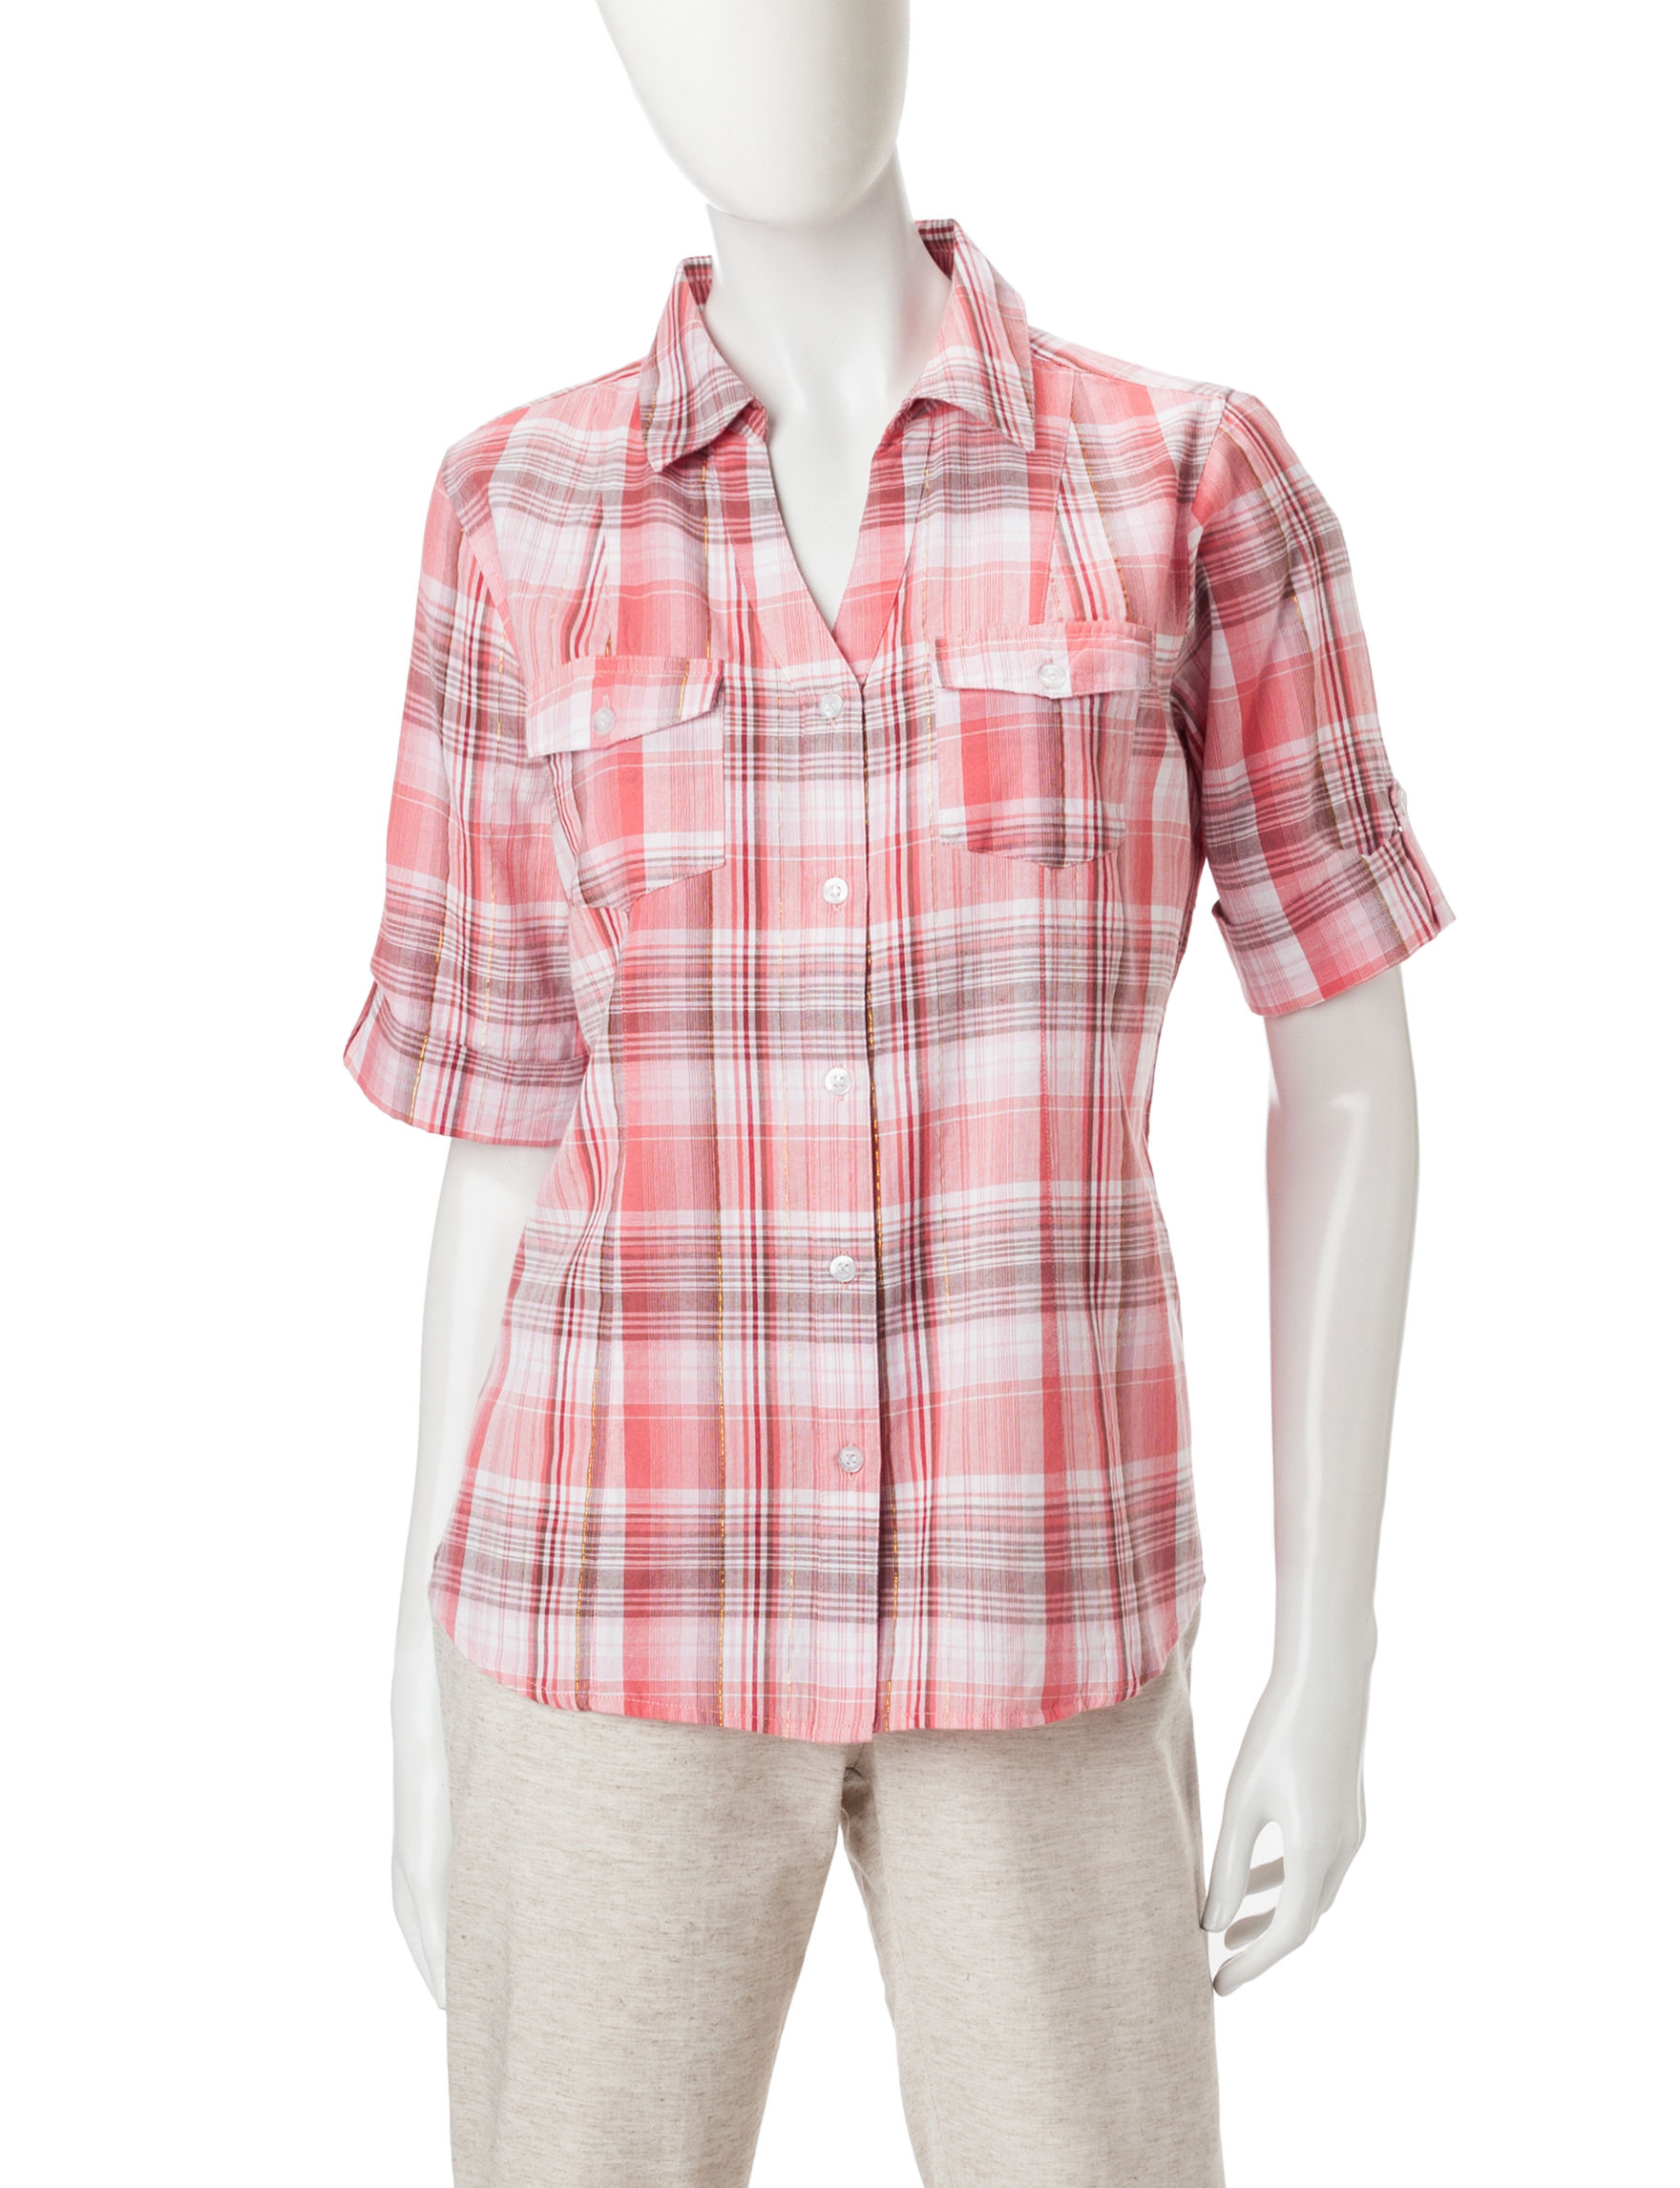 Cathy Daniels Pink Plaid Shirts & Blouses